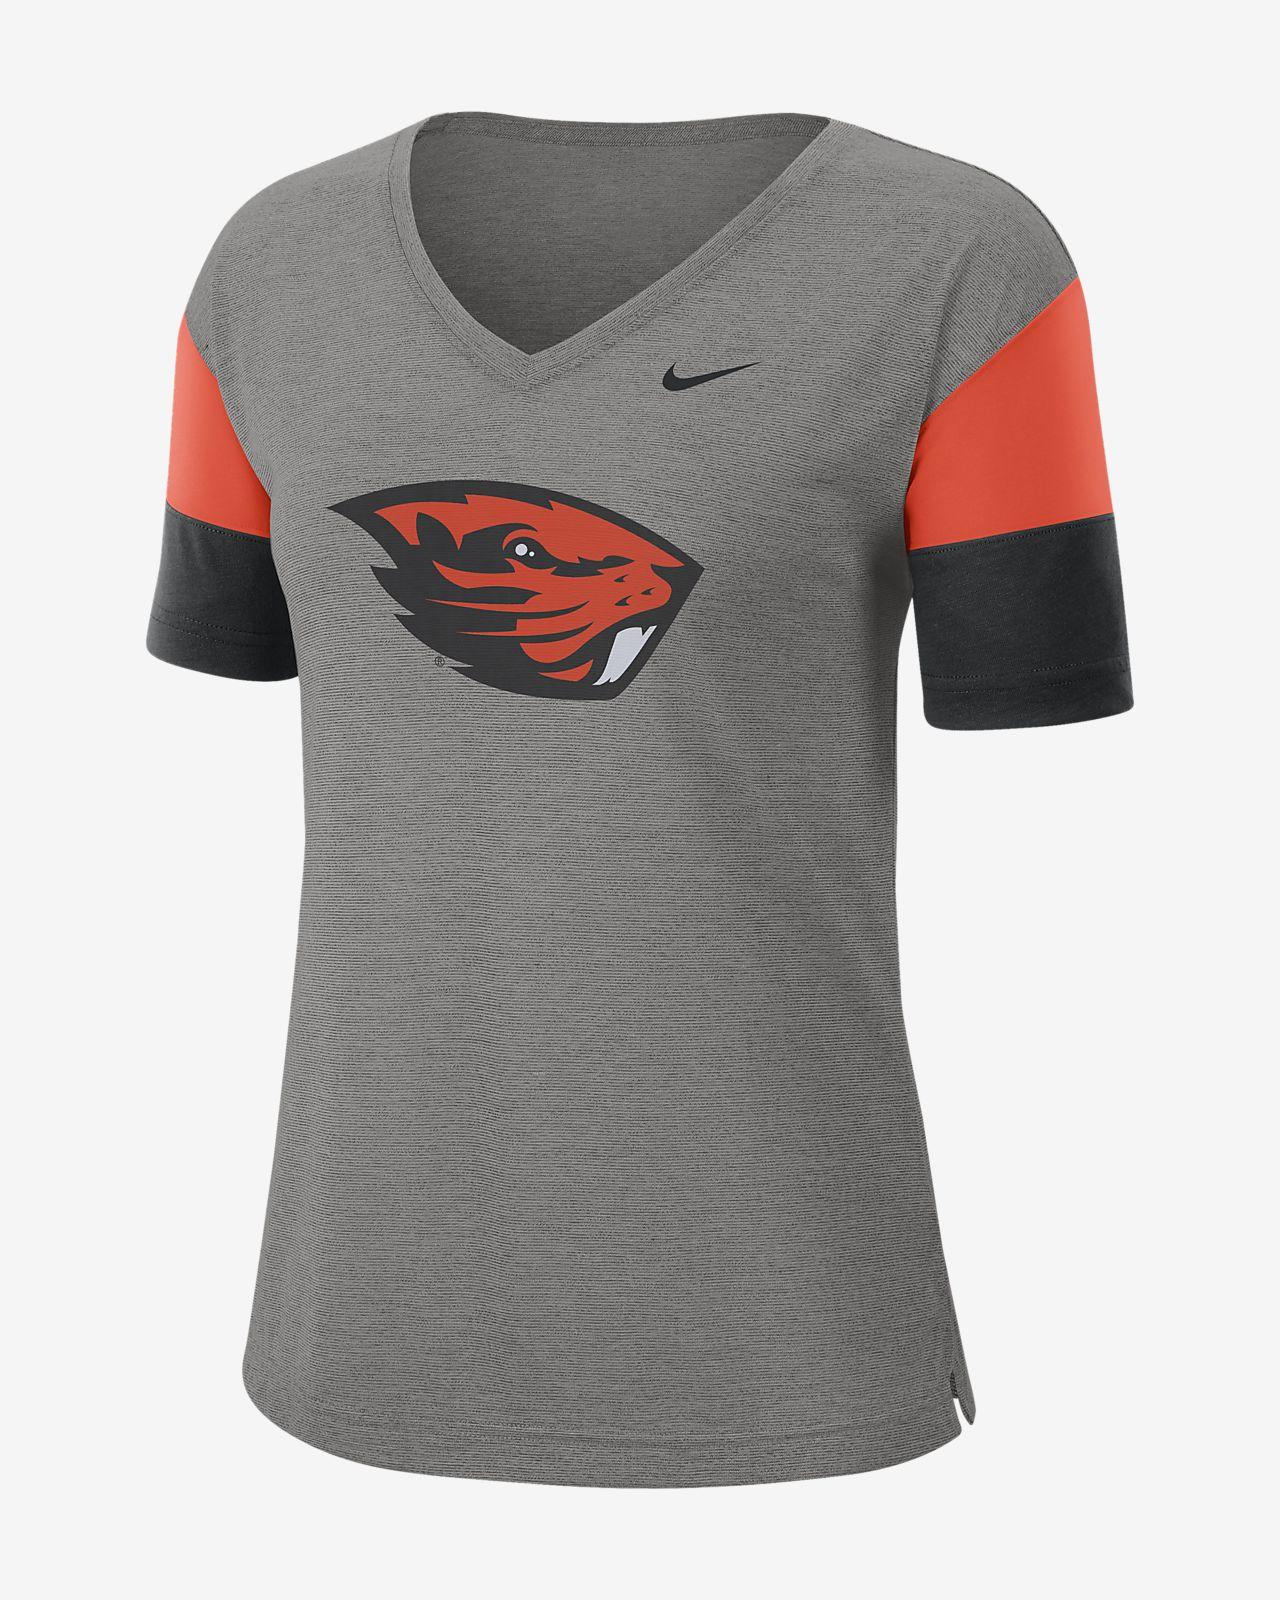 Nike College Breathe (Oregon State) Women's Short-Sleeve V-Neck Top